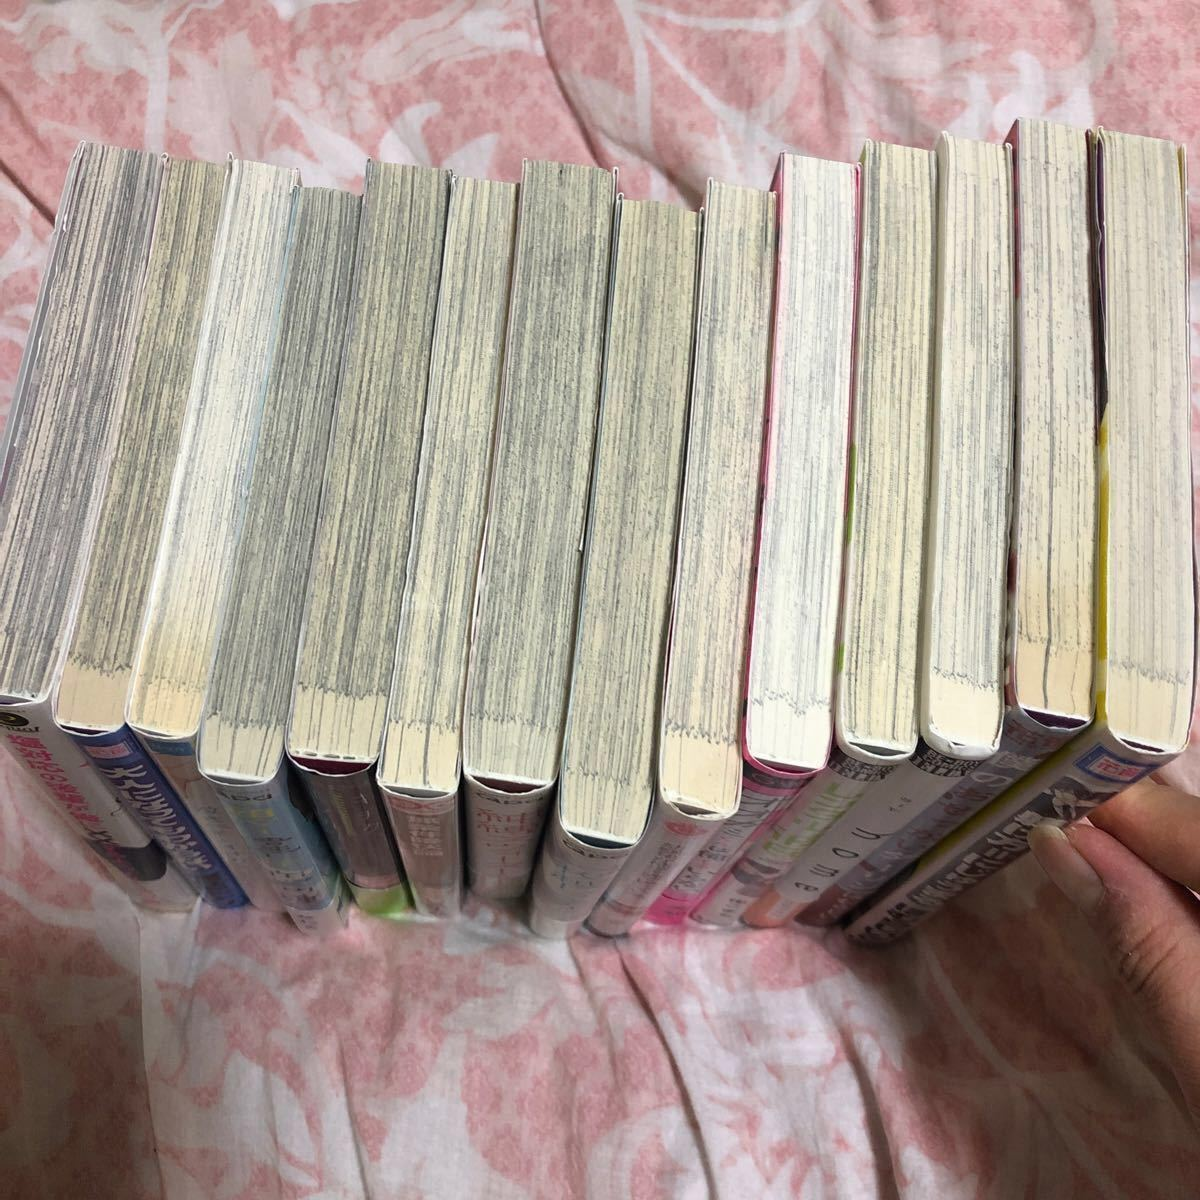 BLコミック12冊セットバラ売り2冊で500円